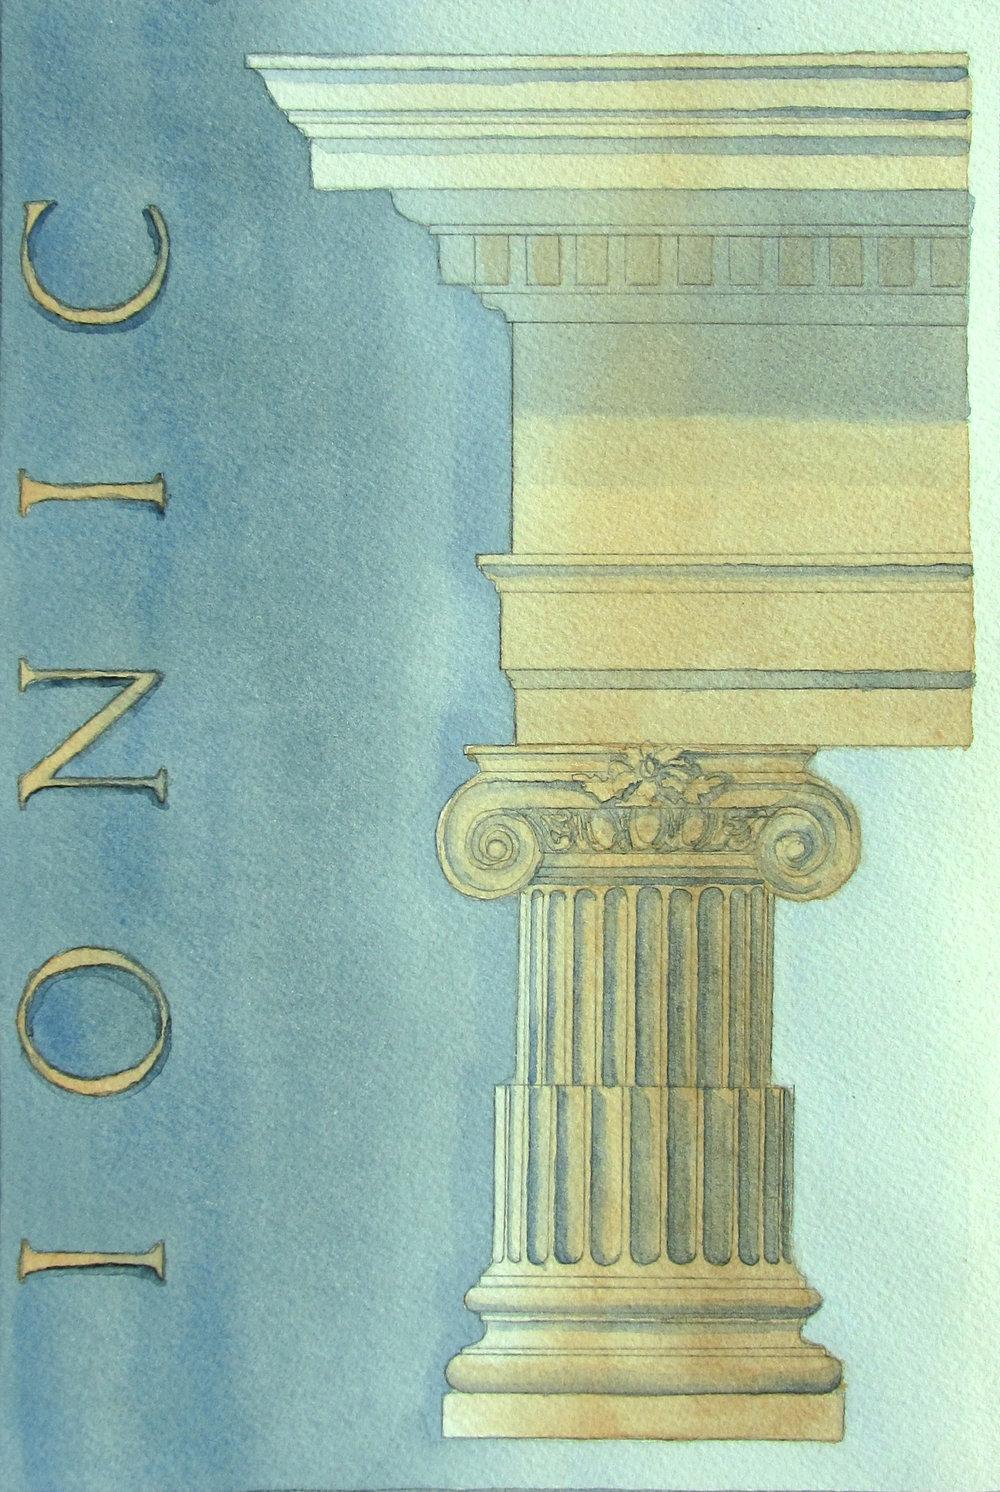 Ionic Column - Artwork by Rebecca Noll